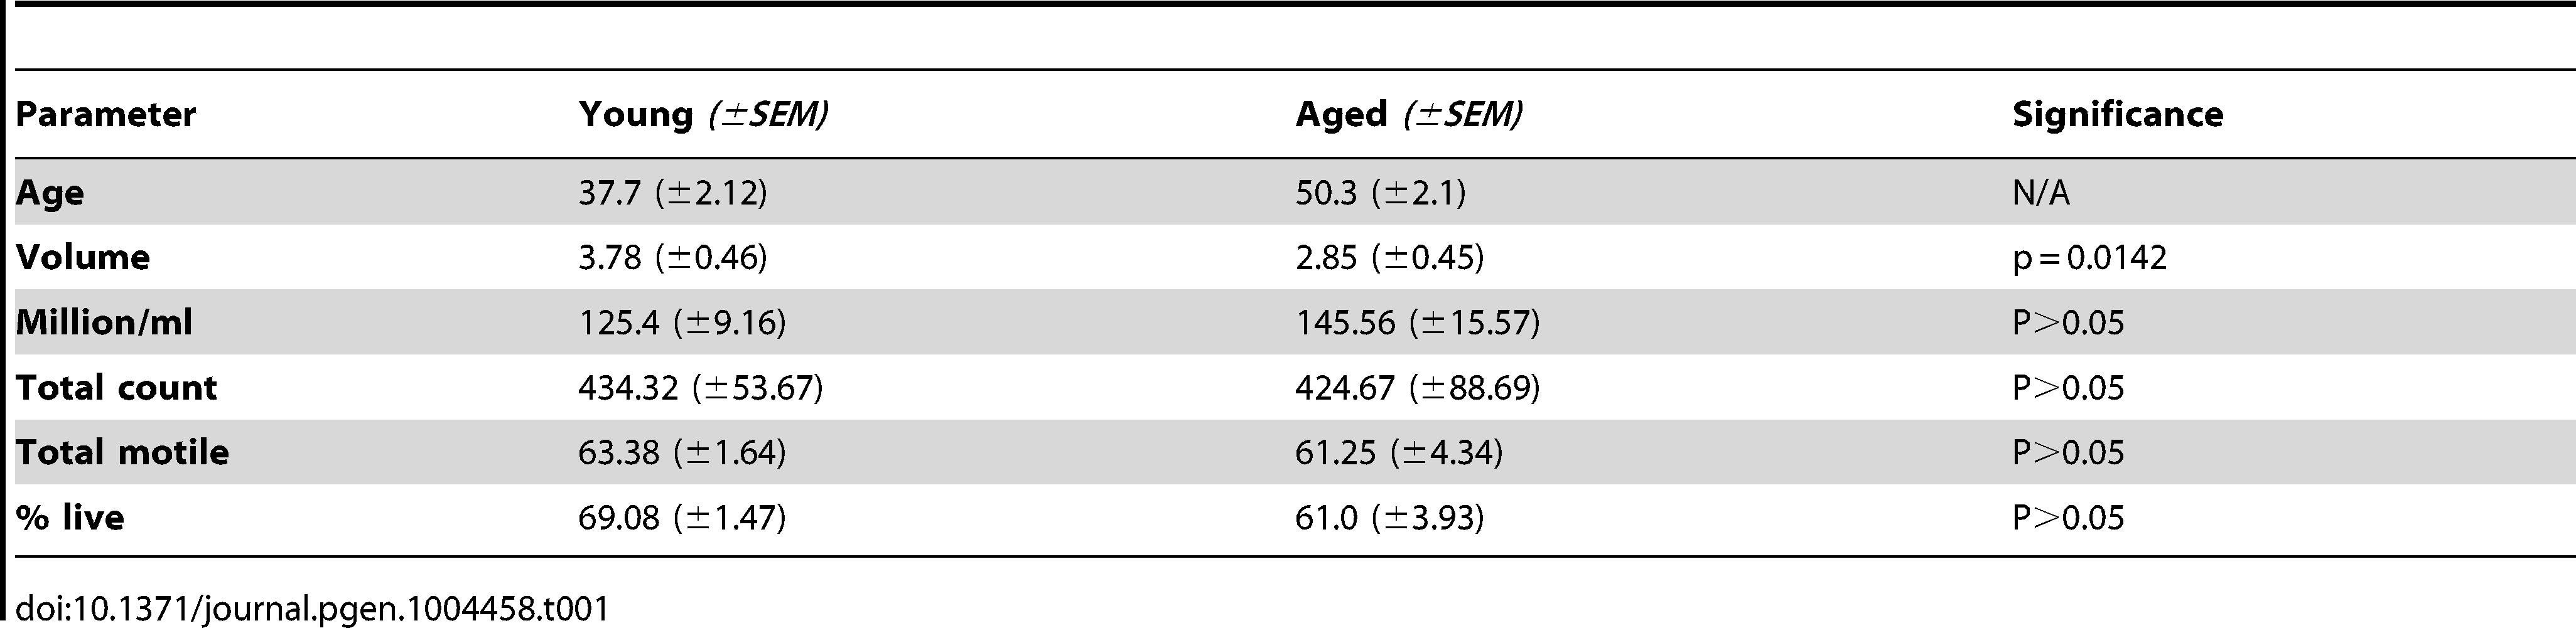 Donor demographics.